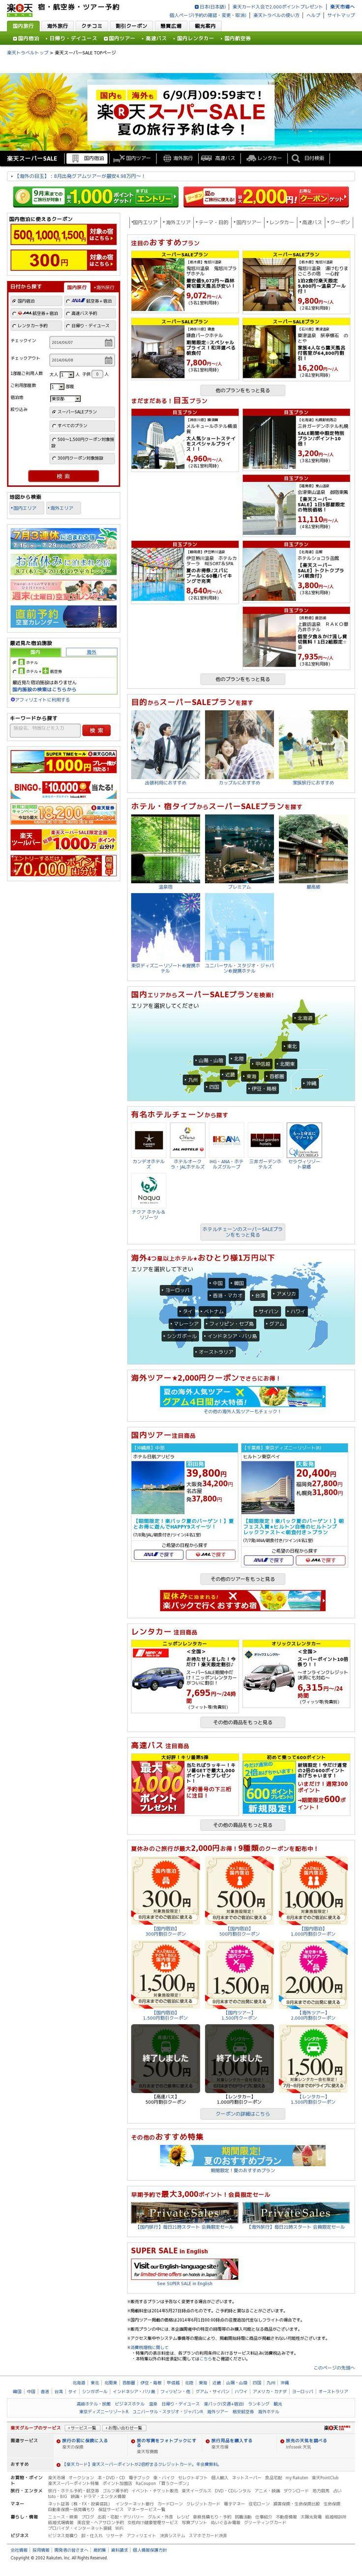 2014/5/21【D】スーパーSALE 2014年6月 国内まとめ